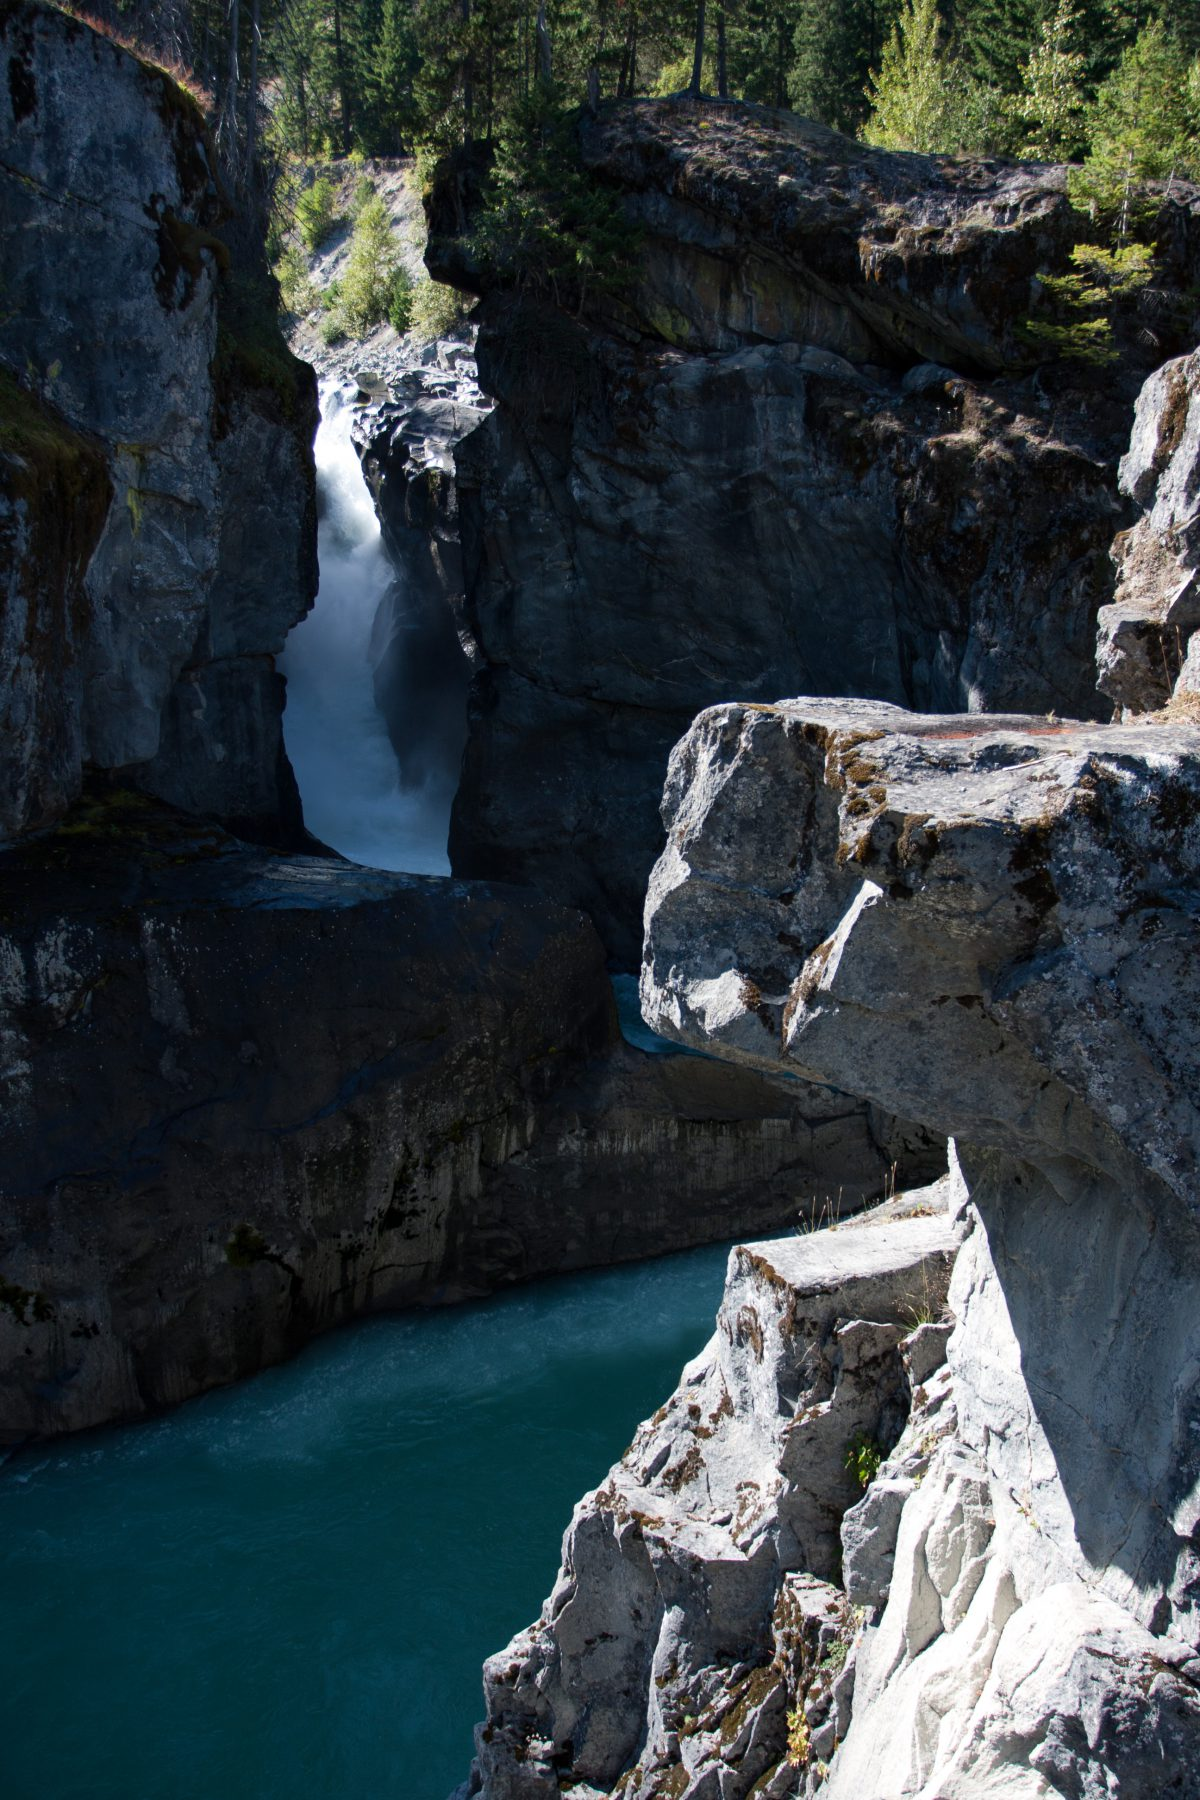 Nairn falls - Nairn falls, waterfall, water